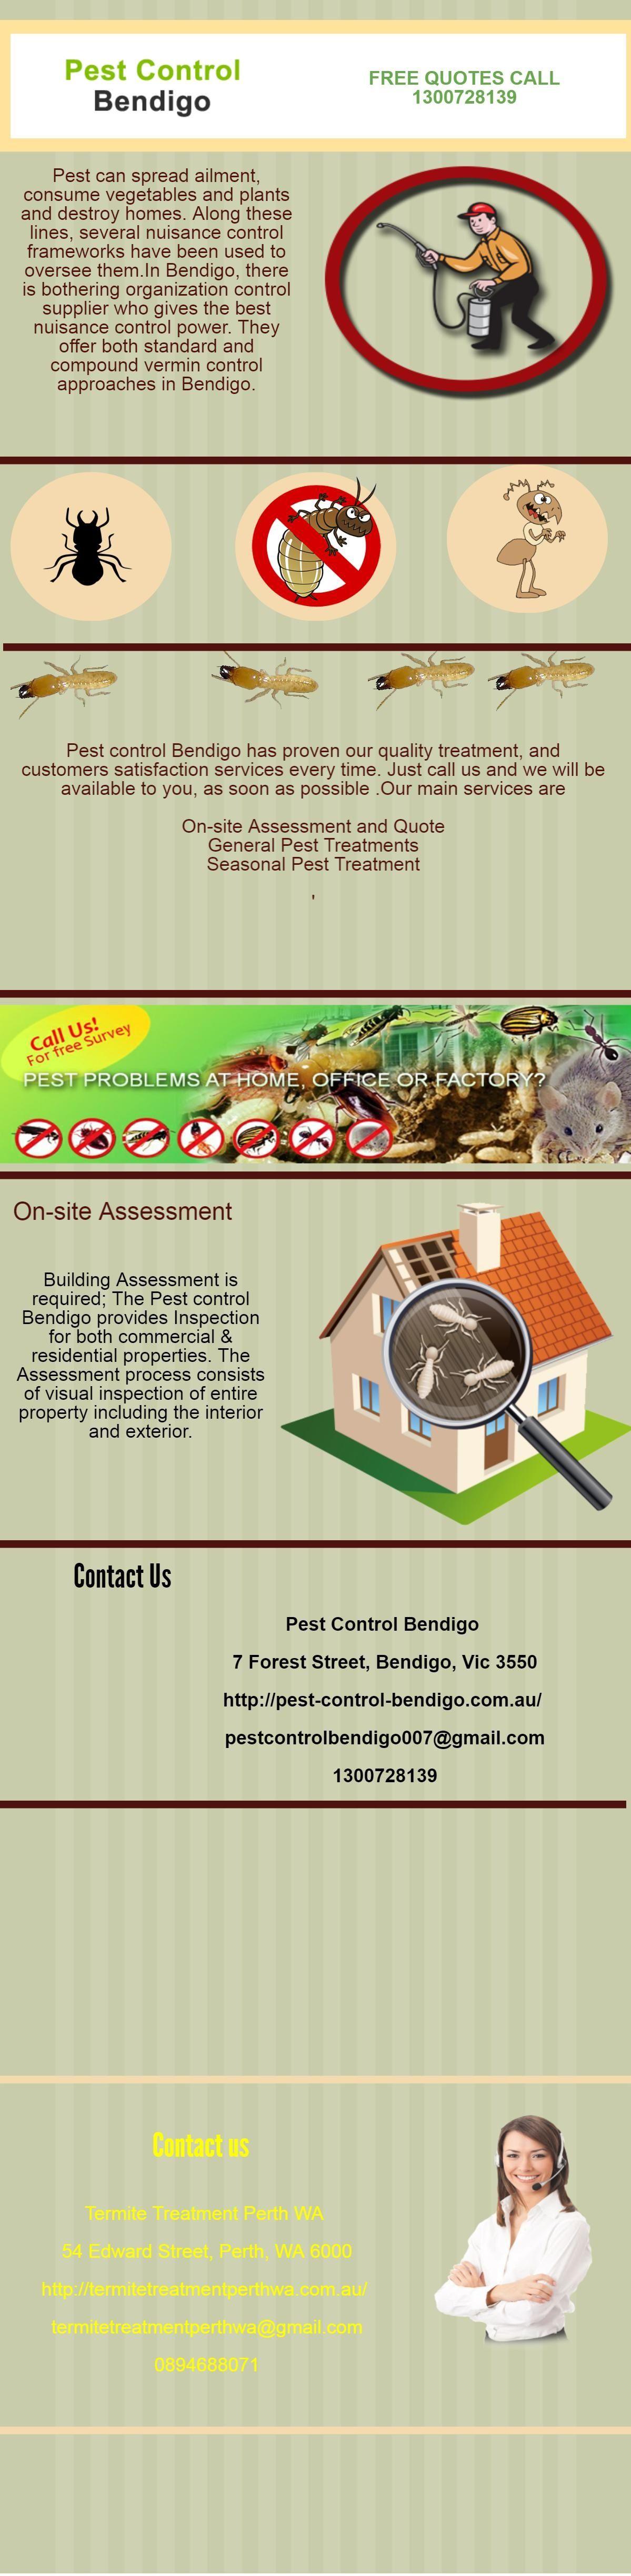 Do you need Best Pest Inspection Bendigo at very